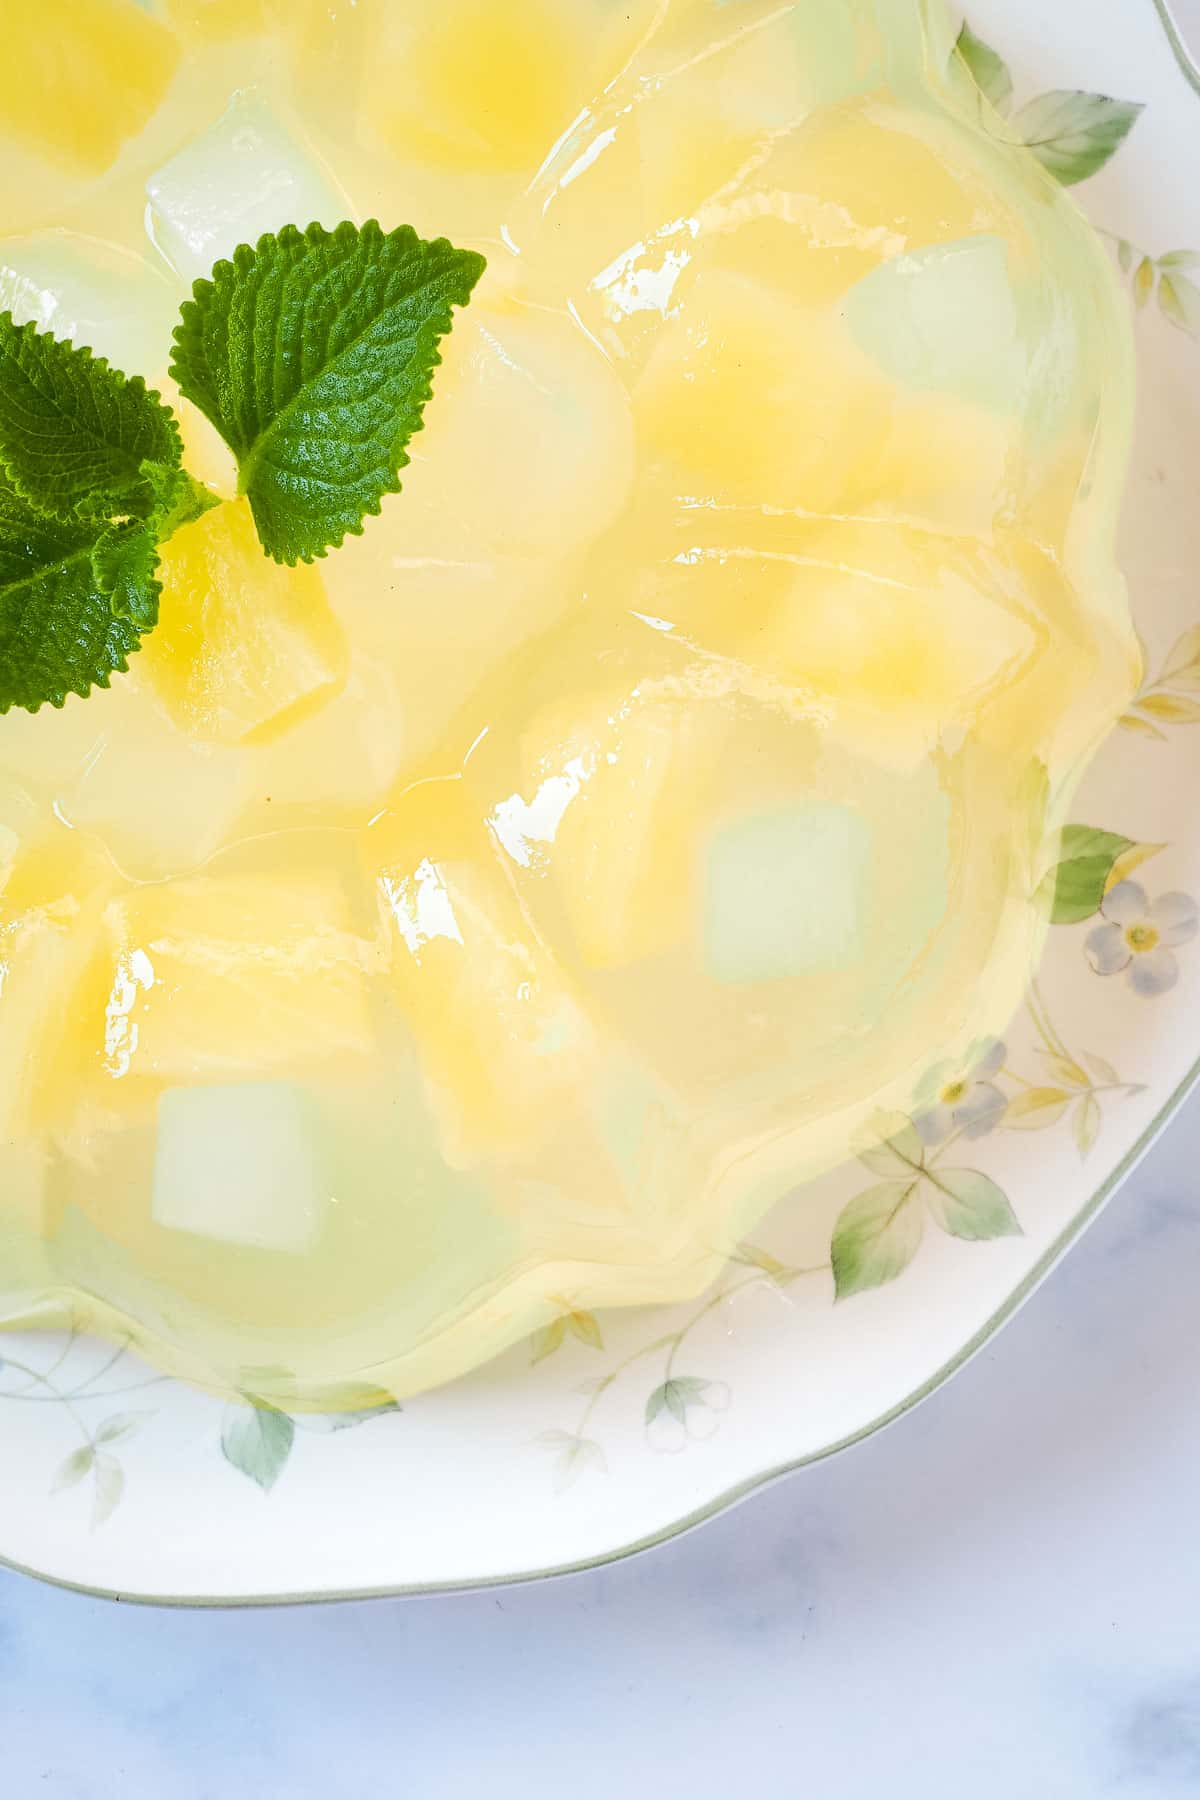 Agar fruit jelly in a bundt cake tin shape, on a floral plate